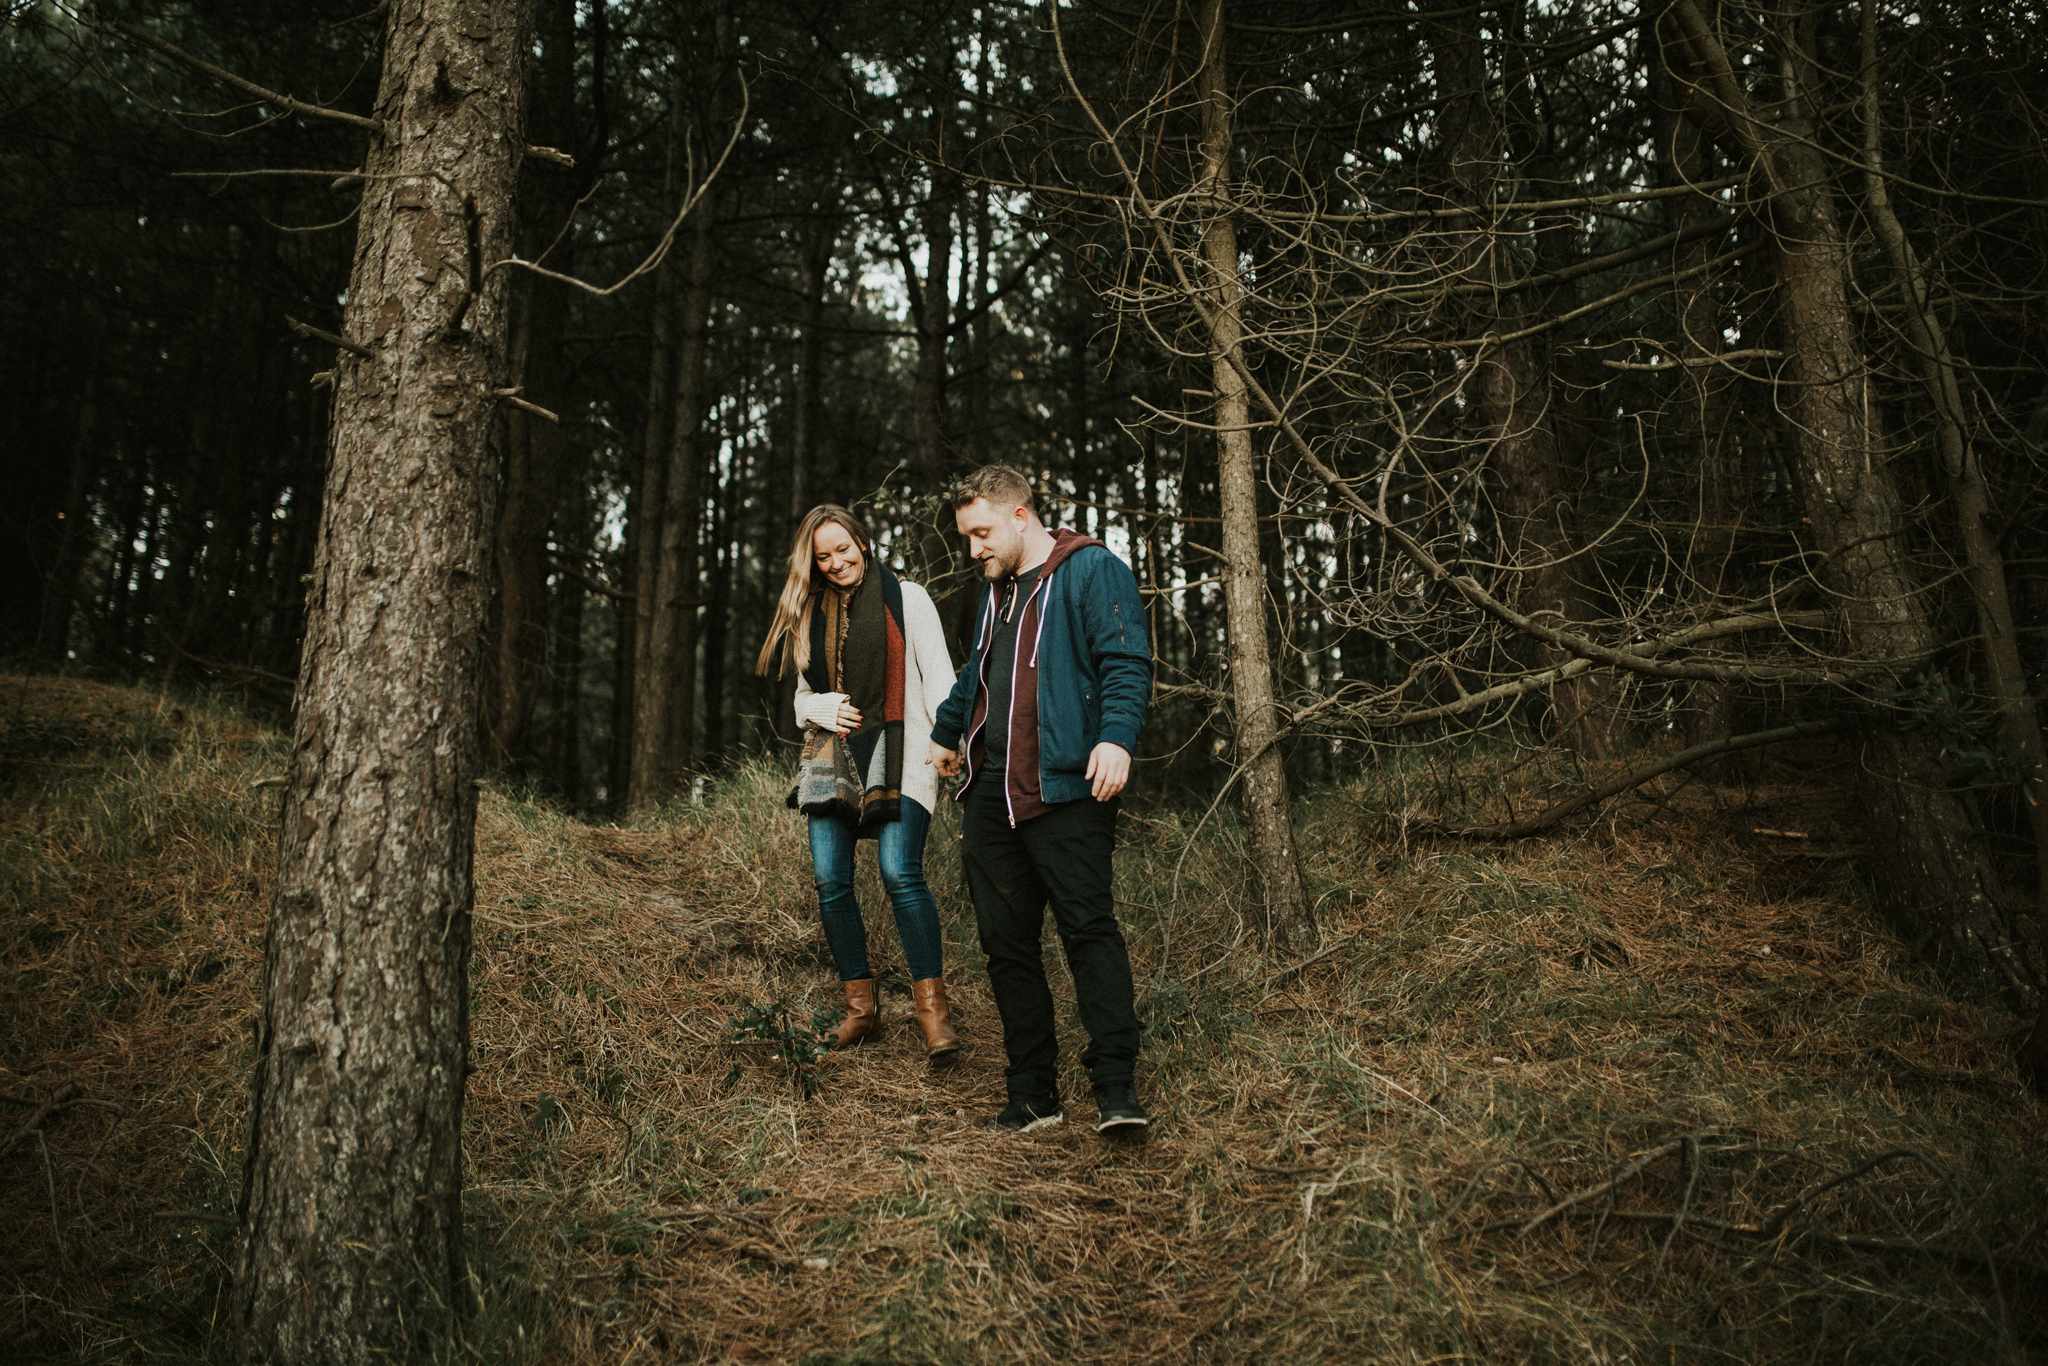 Luke-Mary-Engagement-Adventure-Session-Norfolk-Photography-Photographer-Darina-Stoda-22.jpg